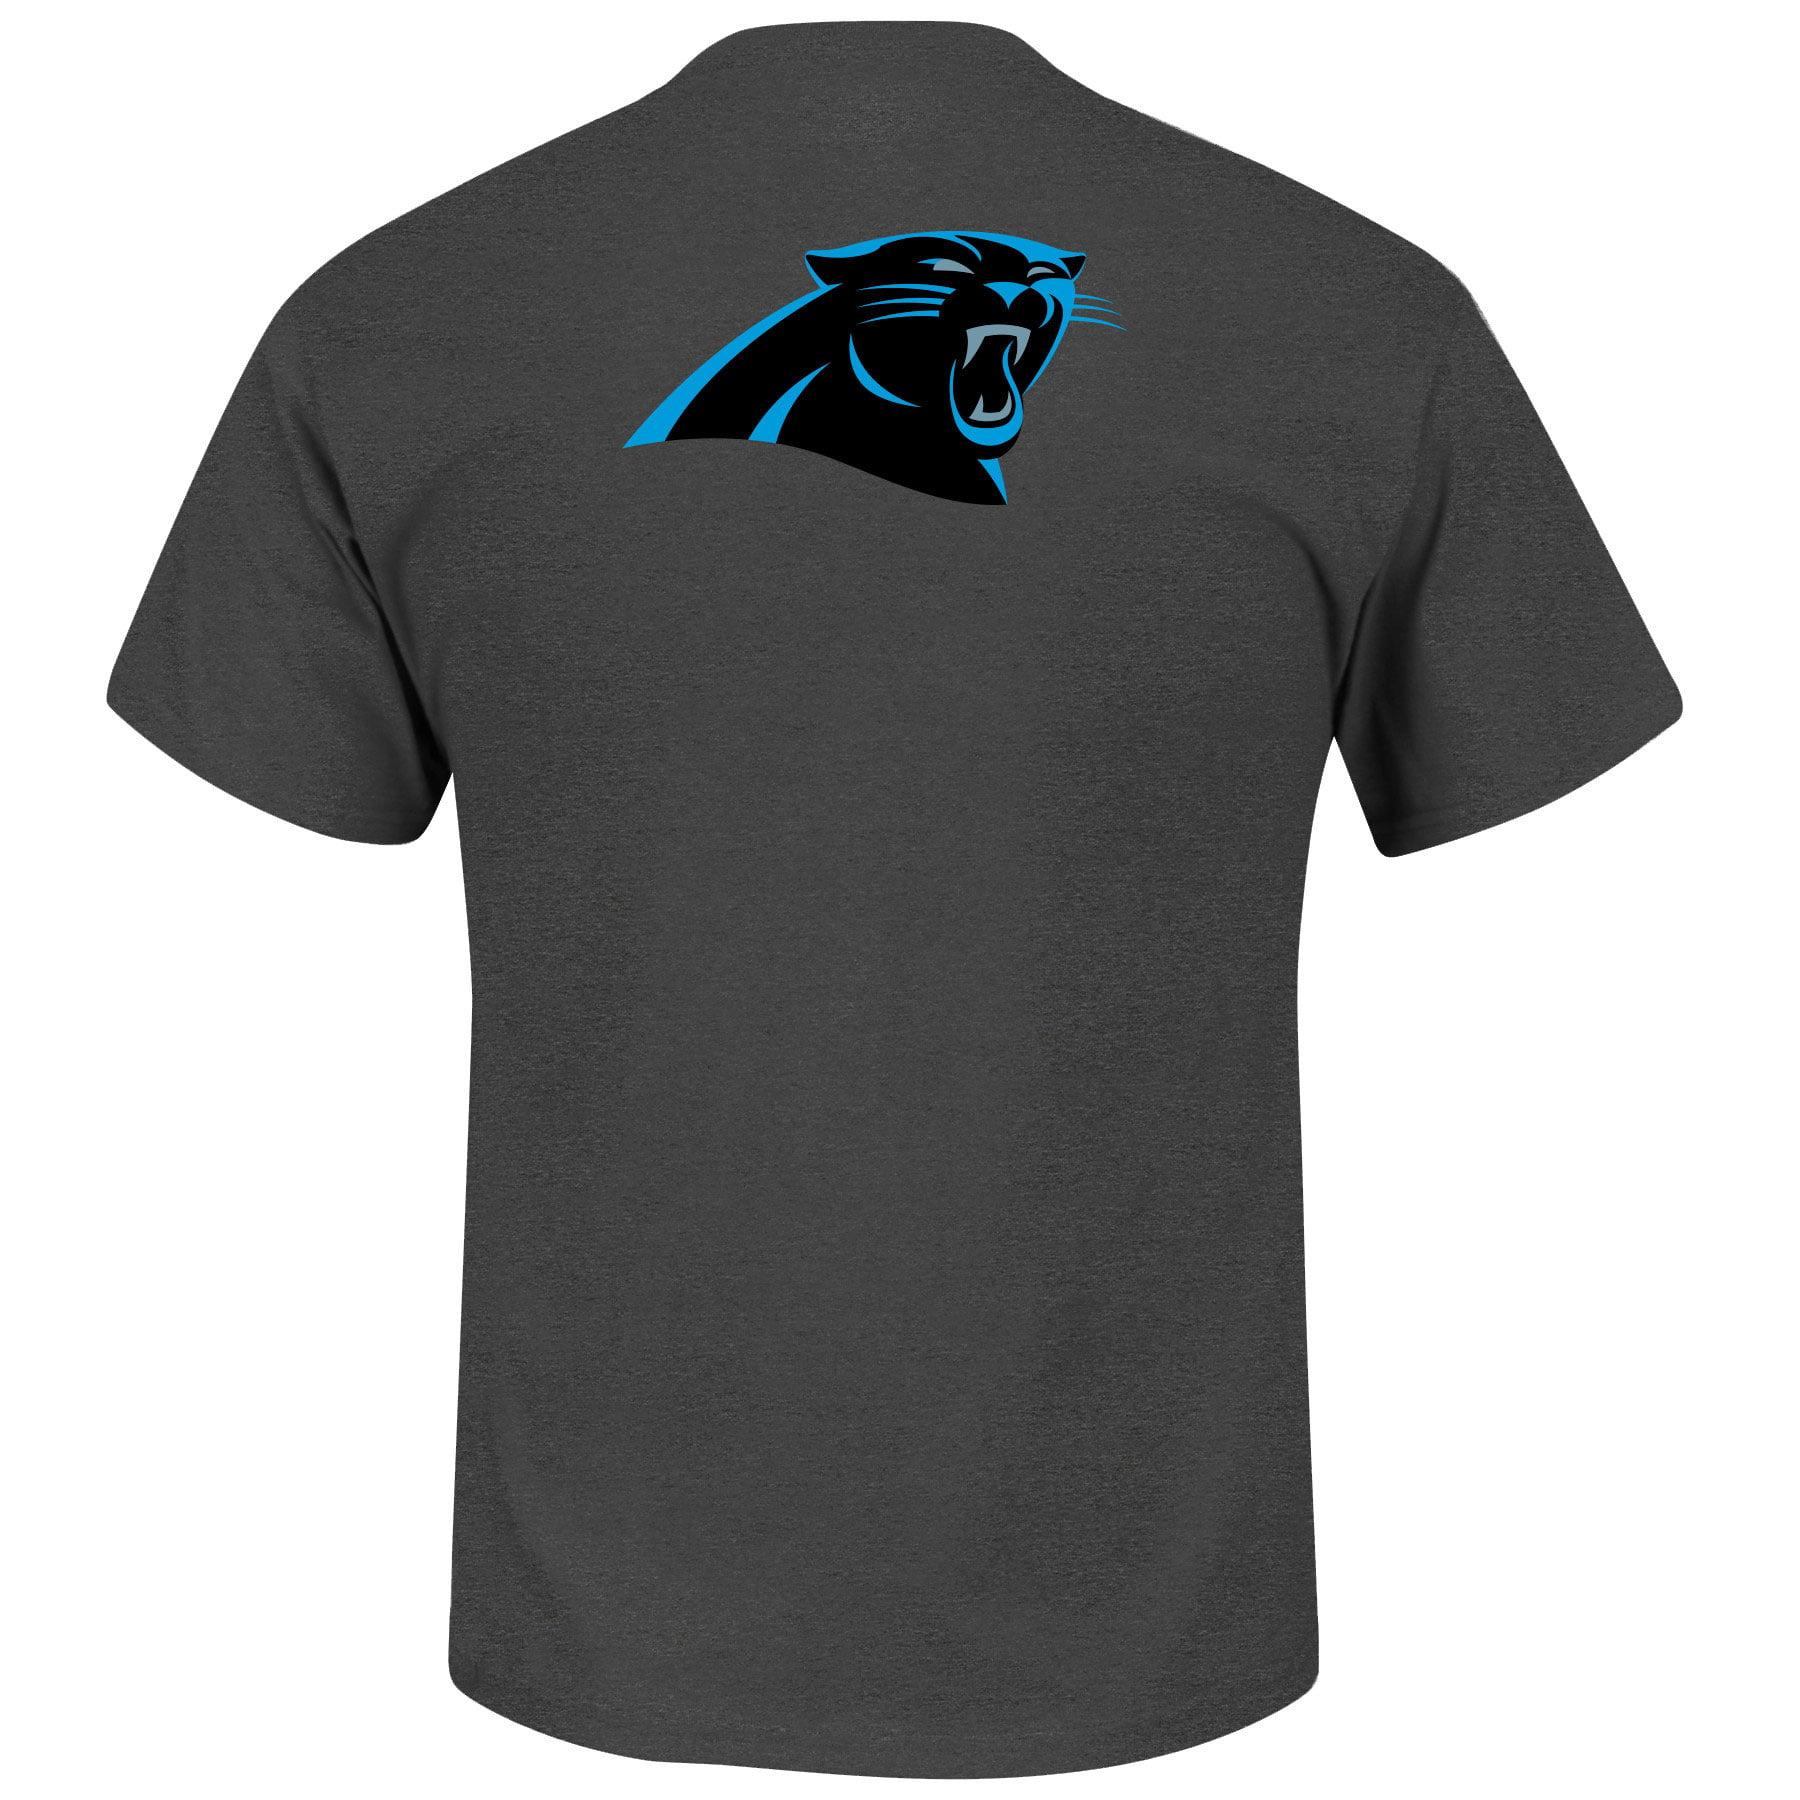 Carolina Panthers Custom Football 2 T-Shirt - Majestic - image 2 of 2